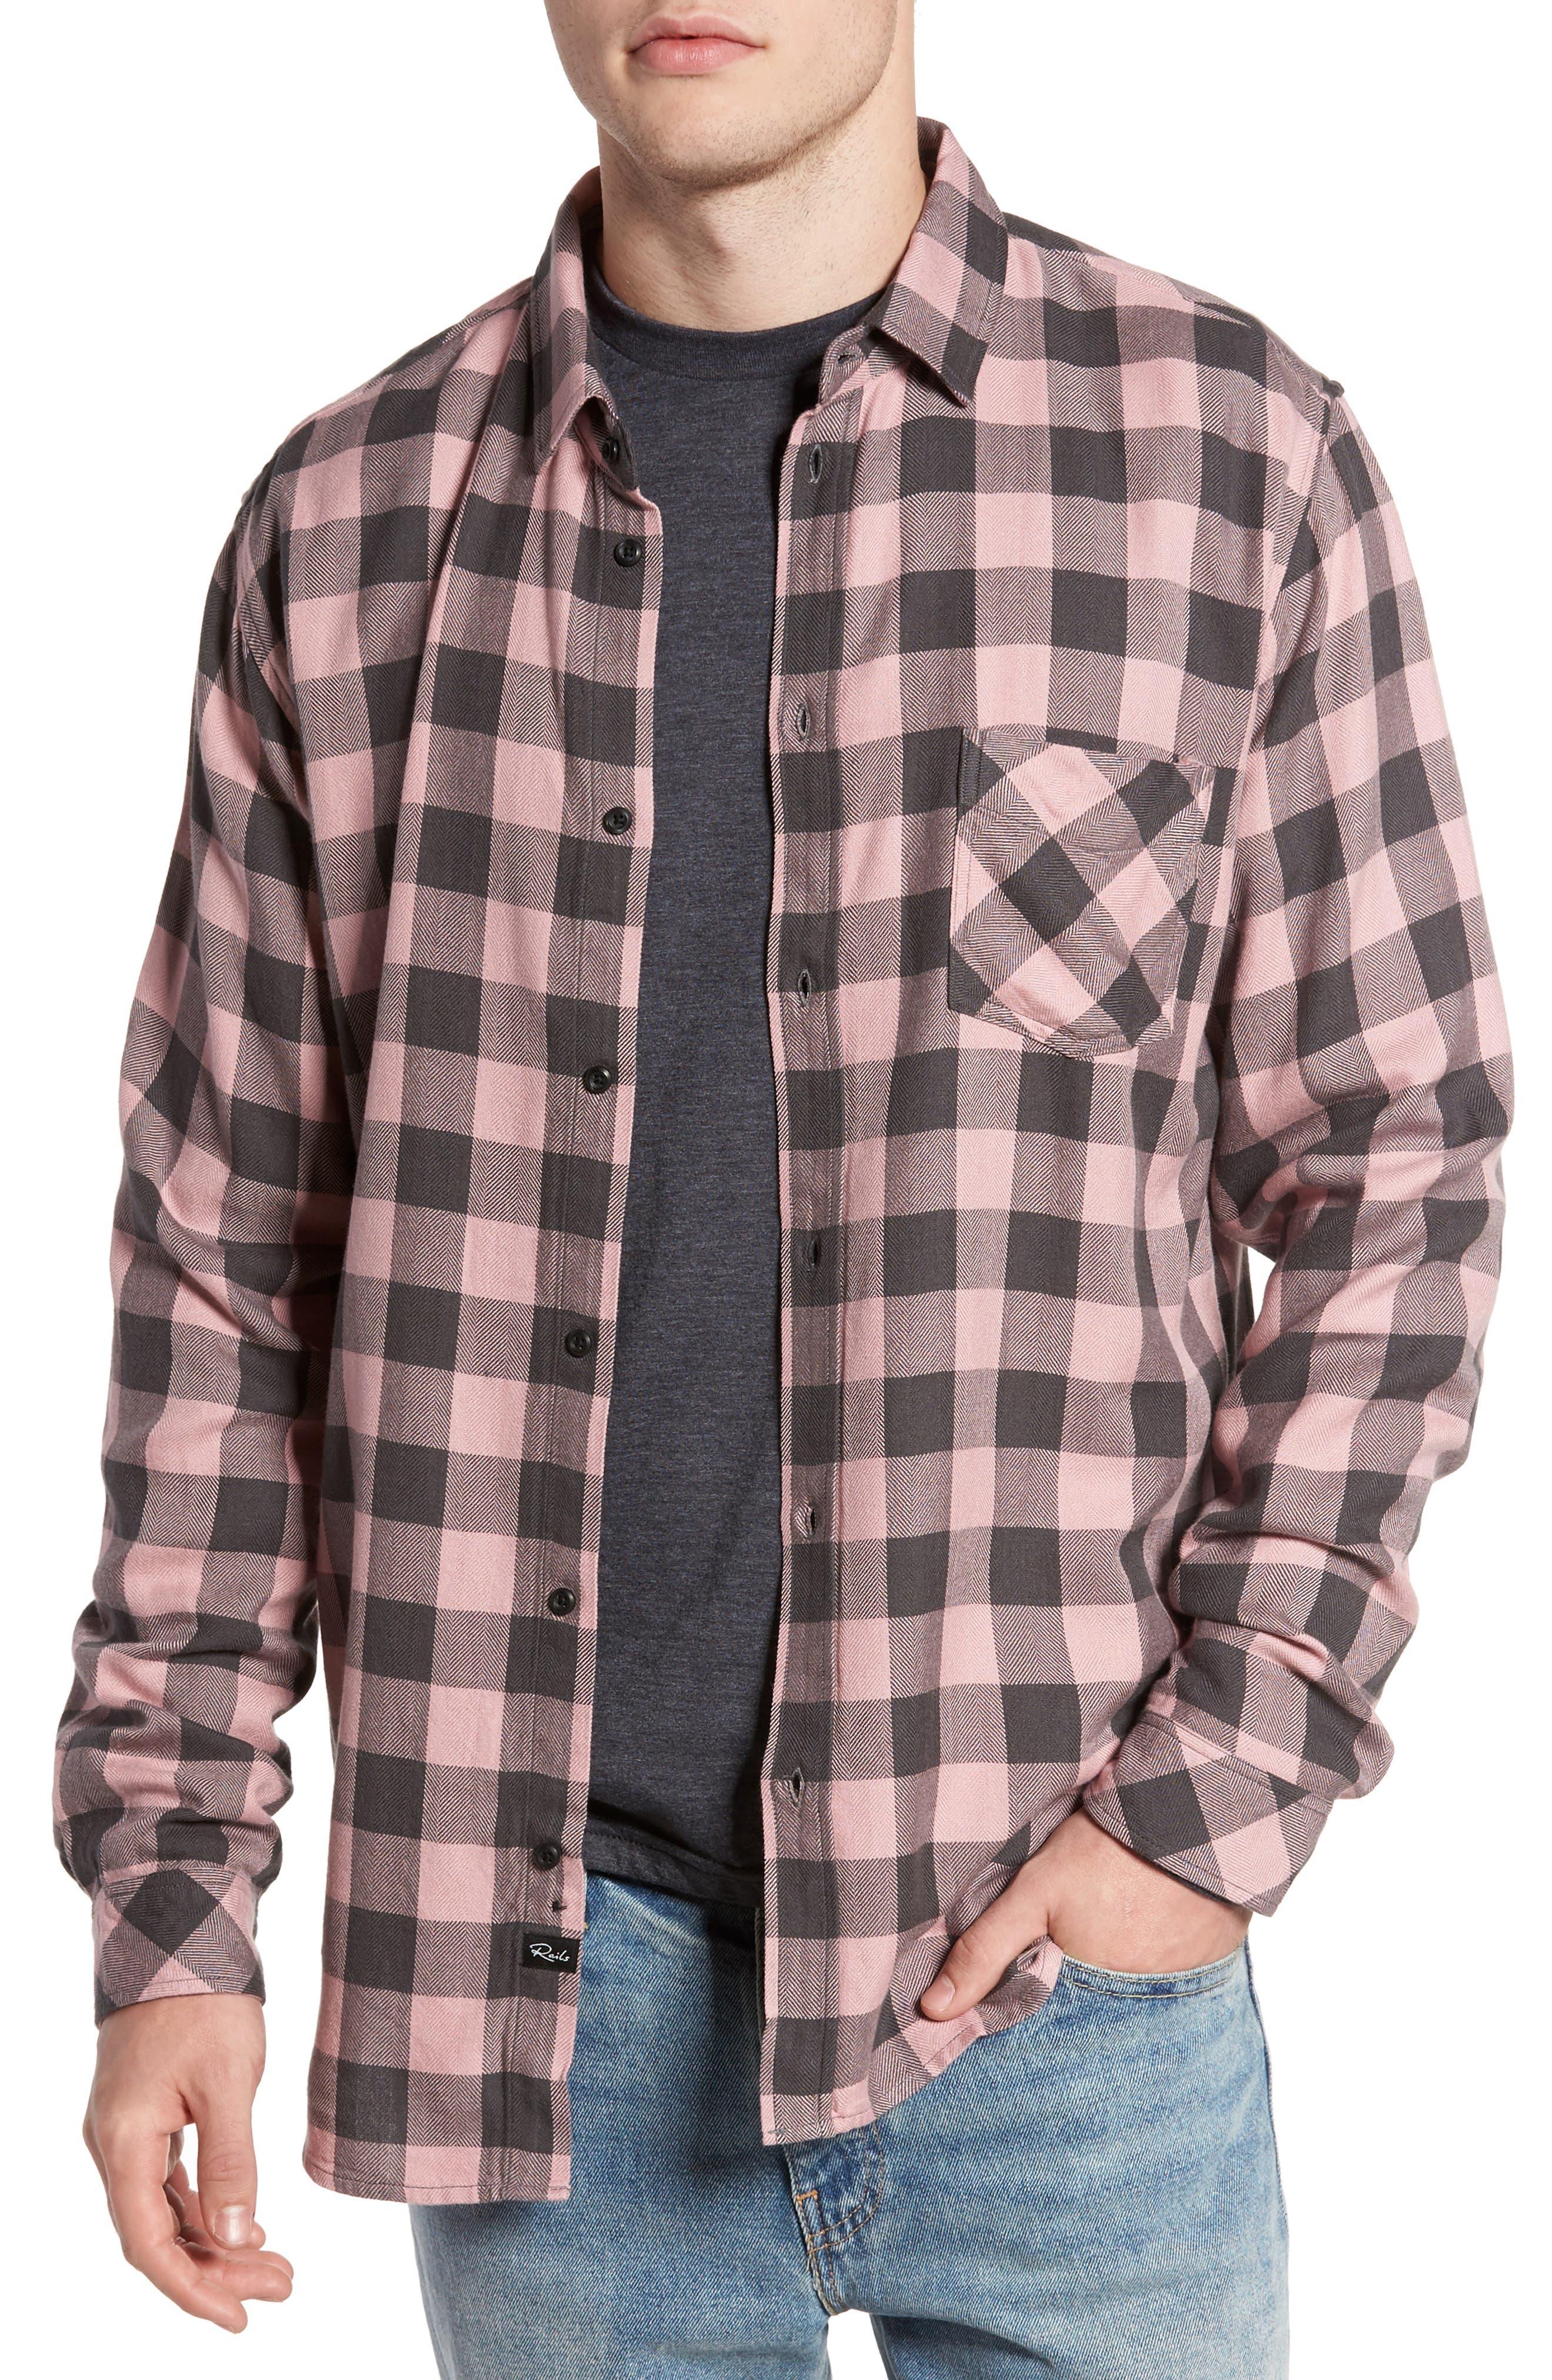 Lennox Sport Shirt,                             Main thumbnail 1, color,                             Pale Pink/ Charcoal